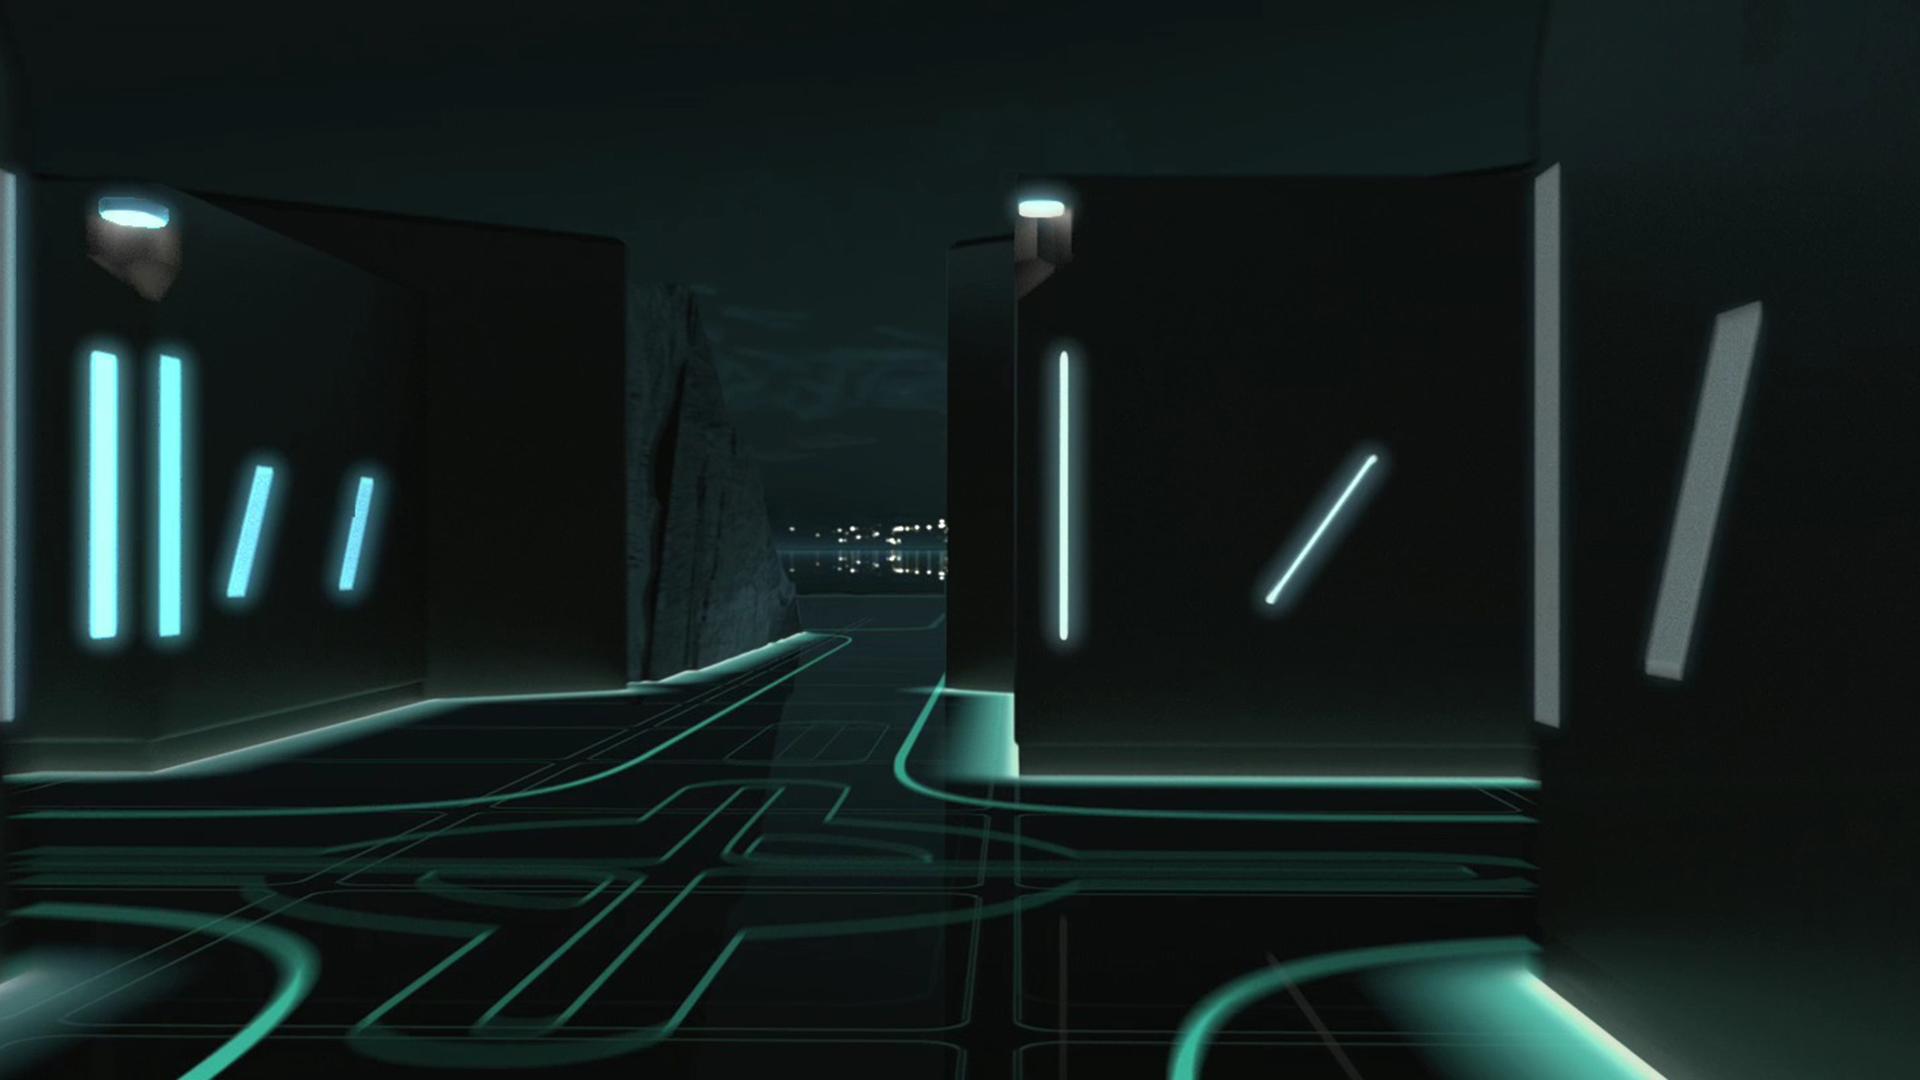 Tron Legacy Wallpaper 1080p - WallpaperSafari